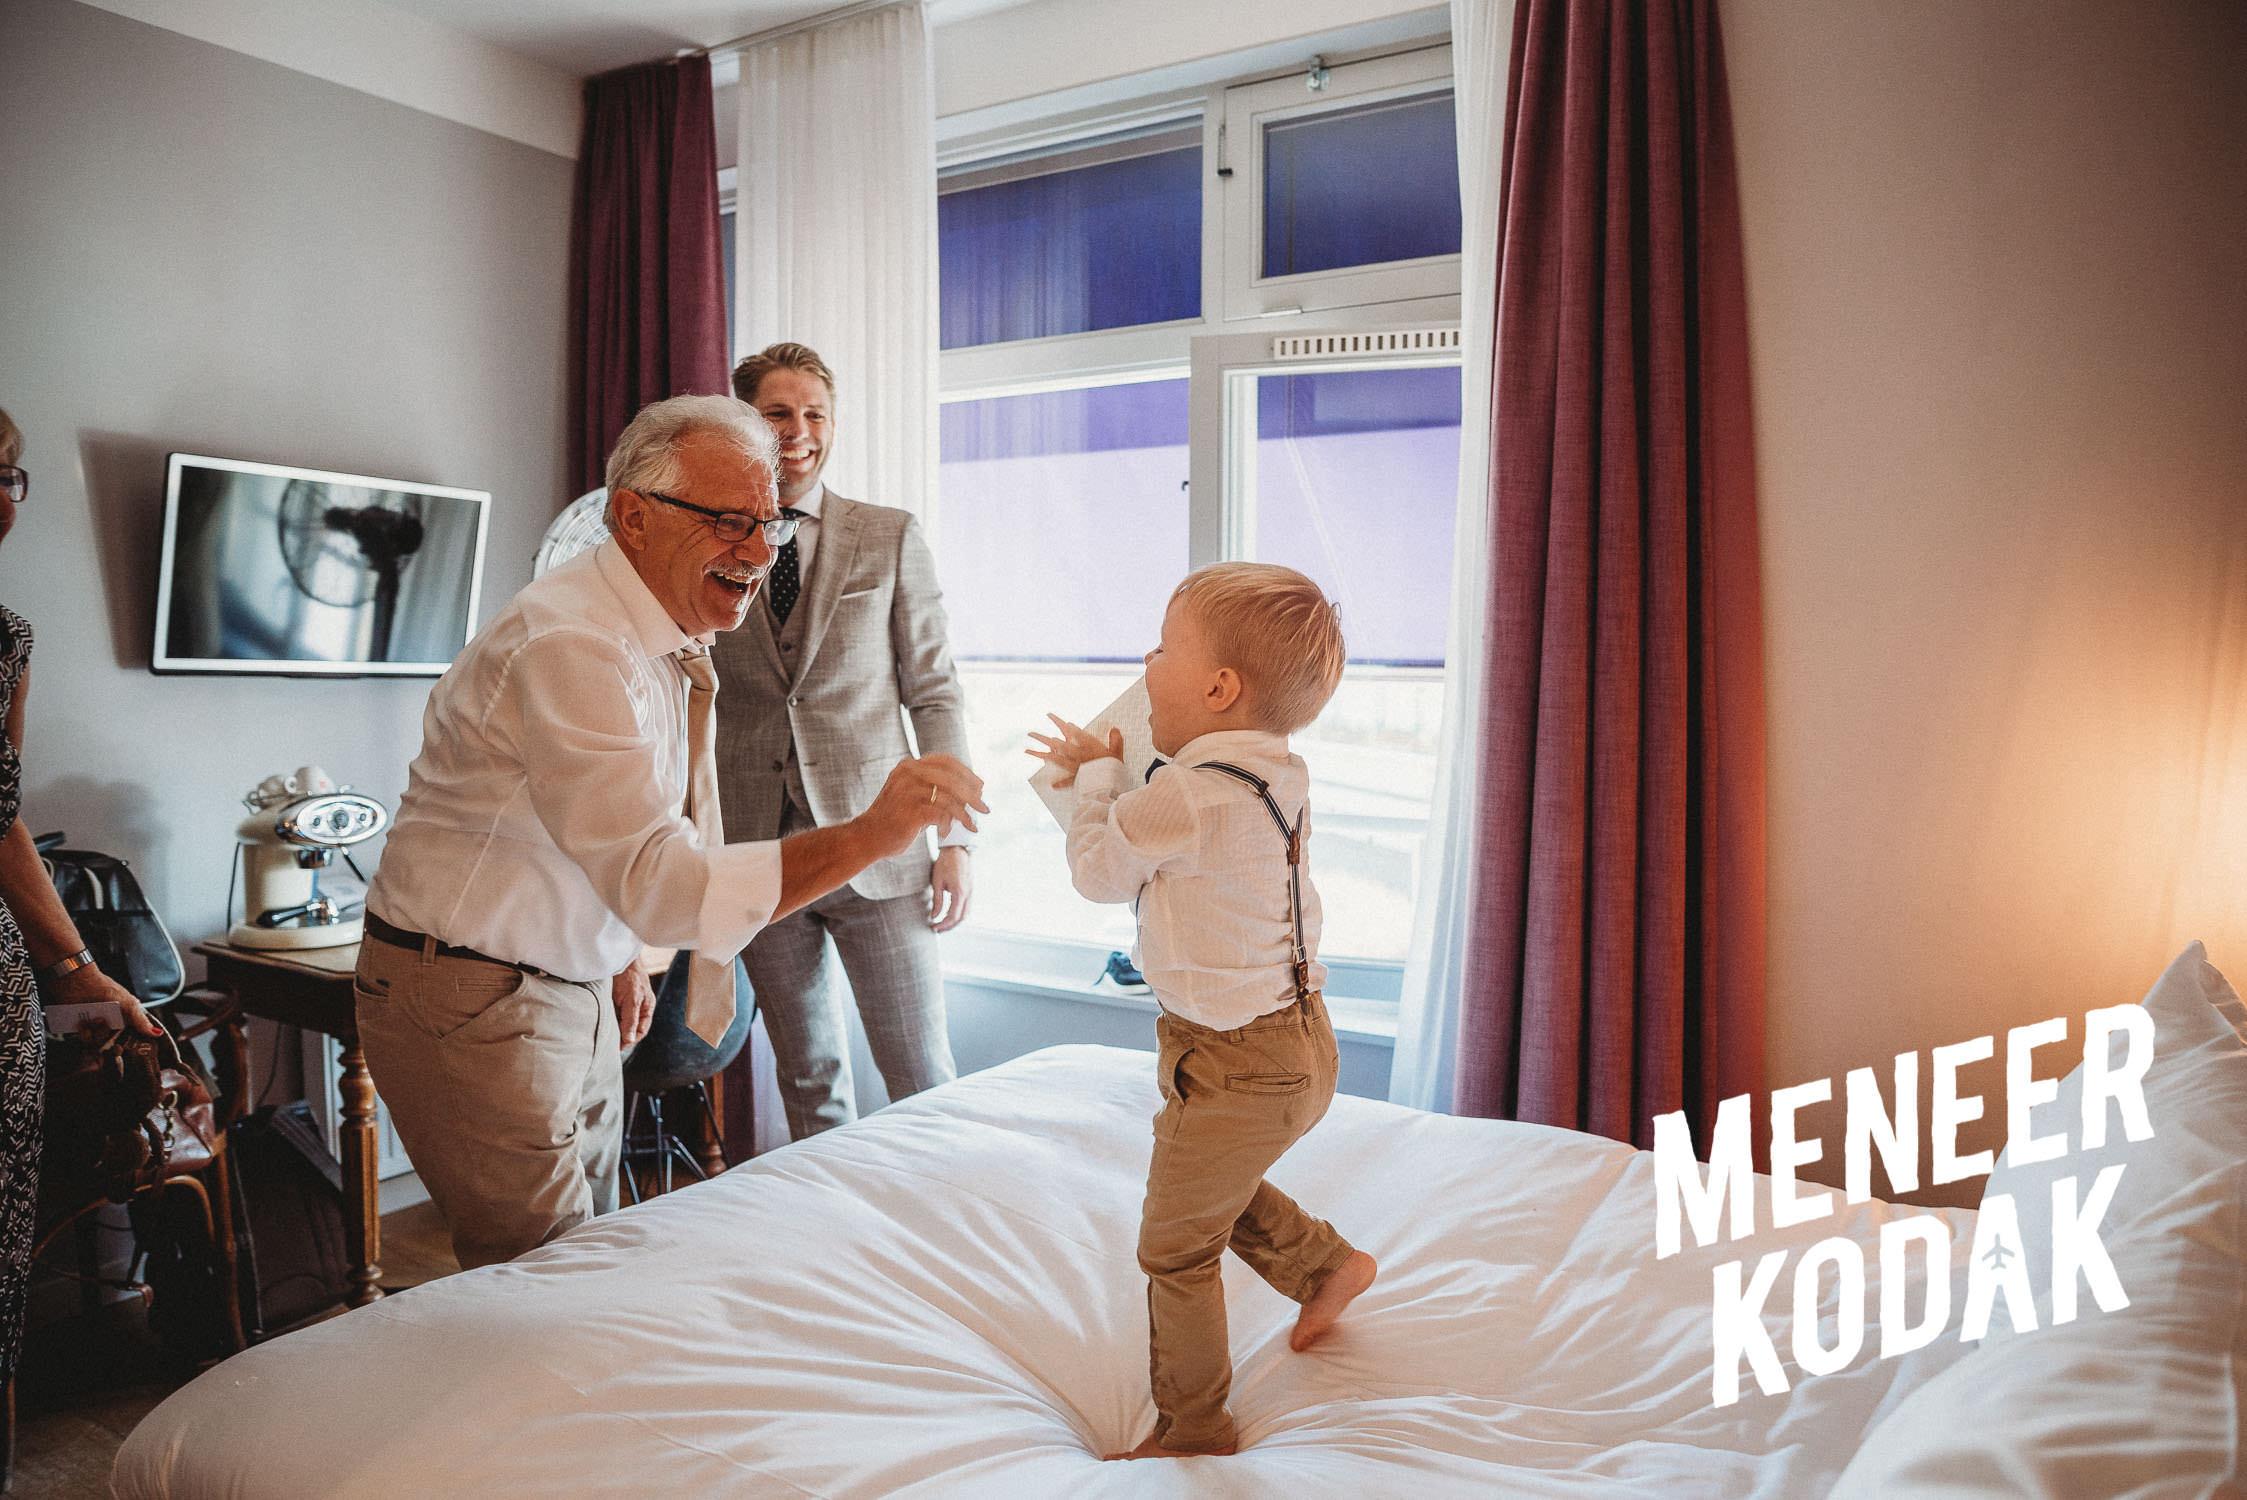 Meneer Kodak - Strandbruiloft - Noordwijk - K&A-062.jpg